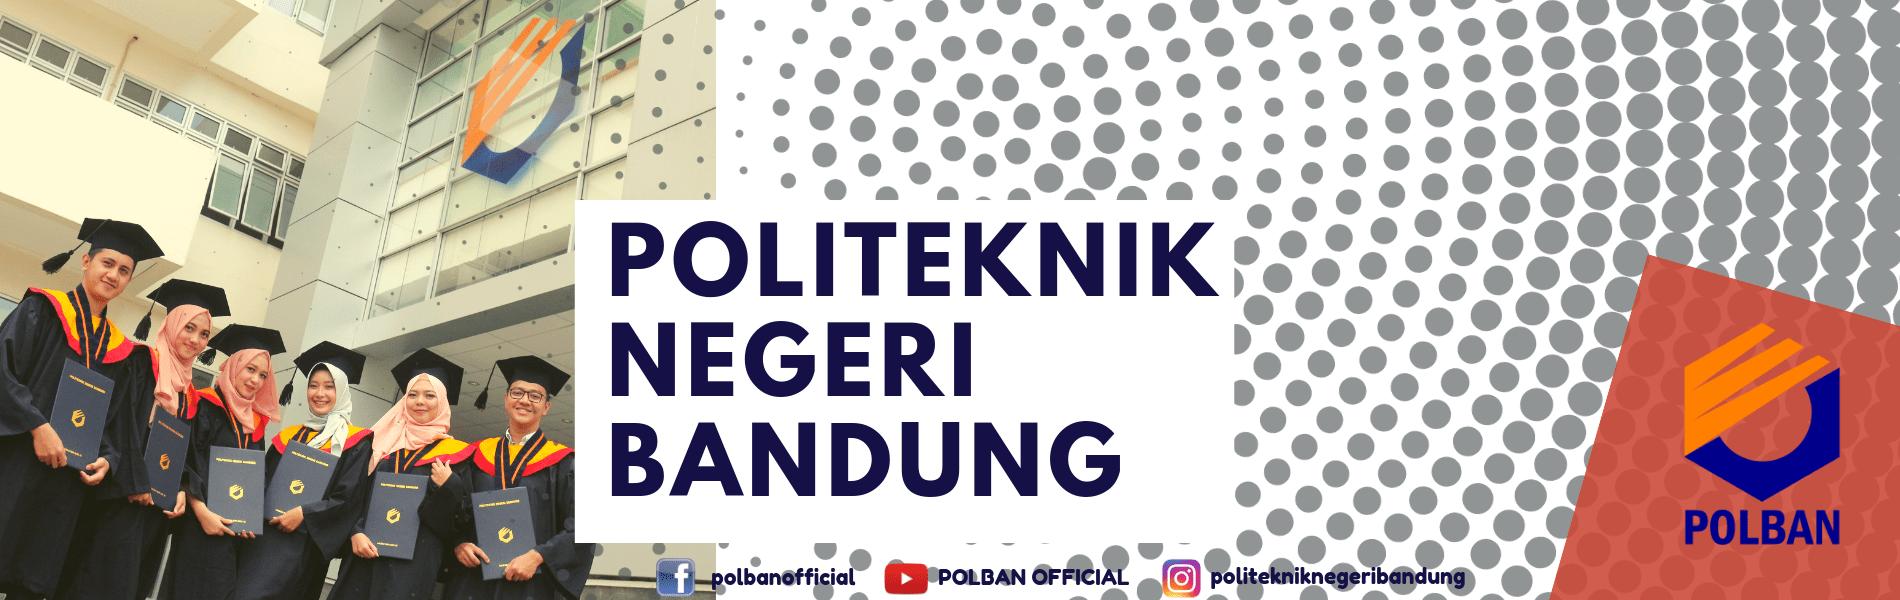 #politekniknegeribandung #polban